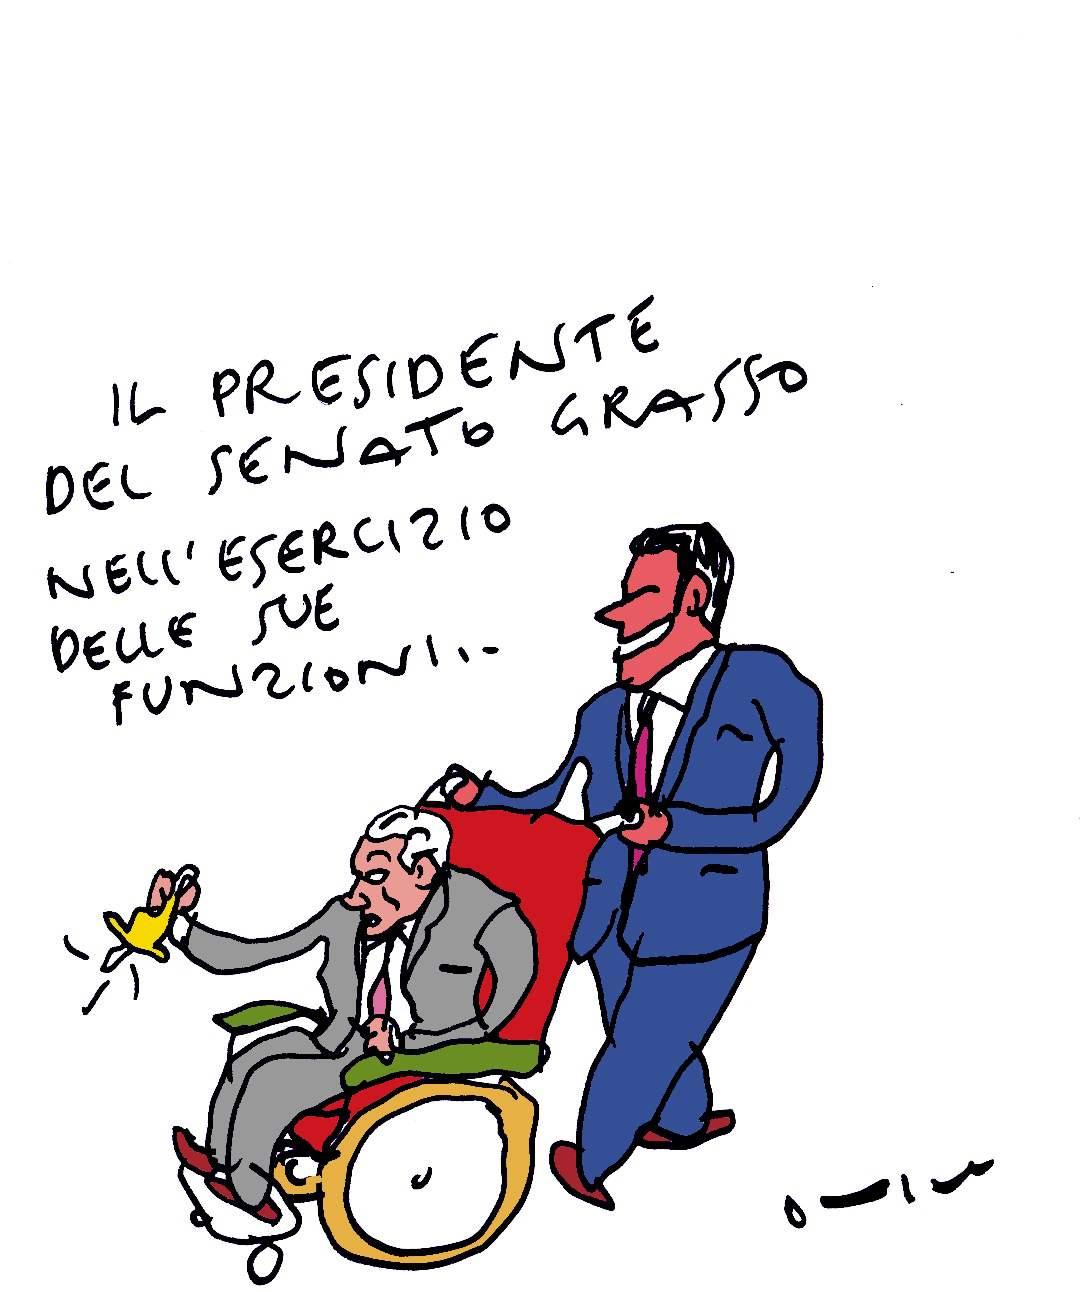 presidente in carrozzellka